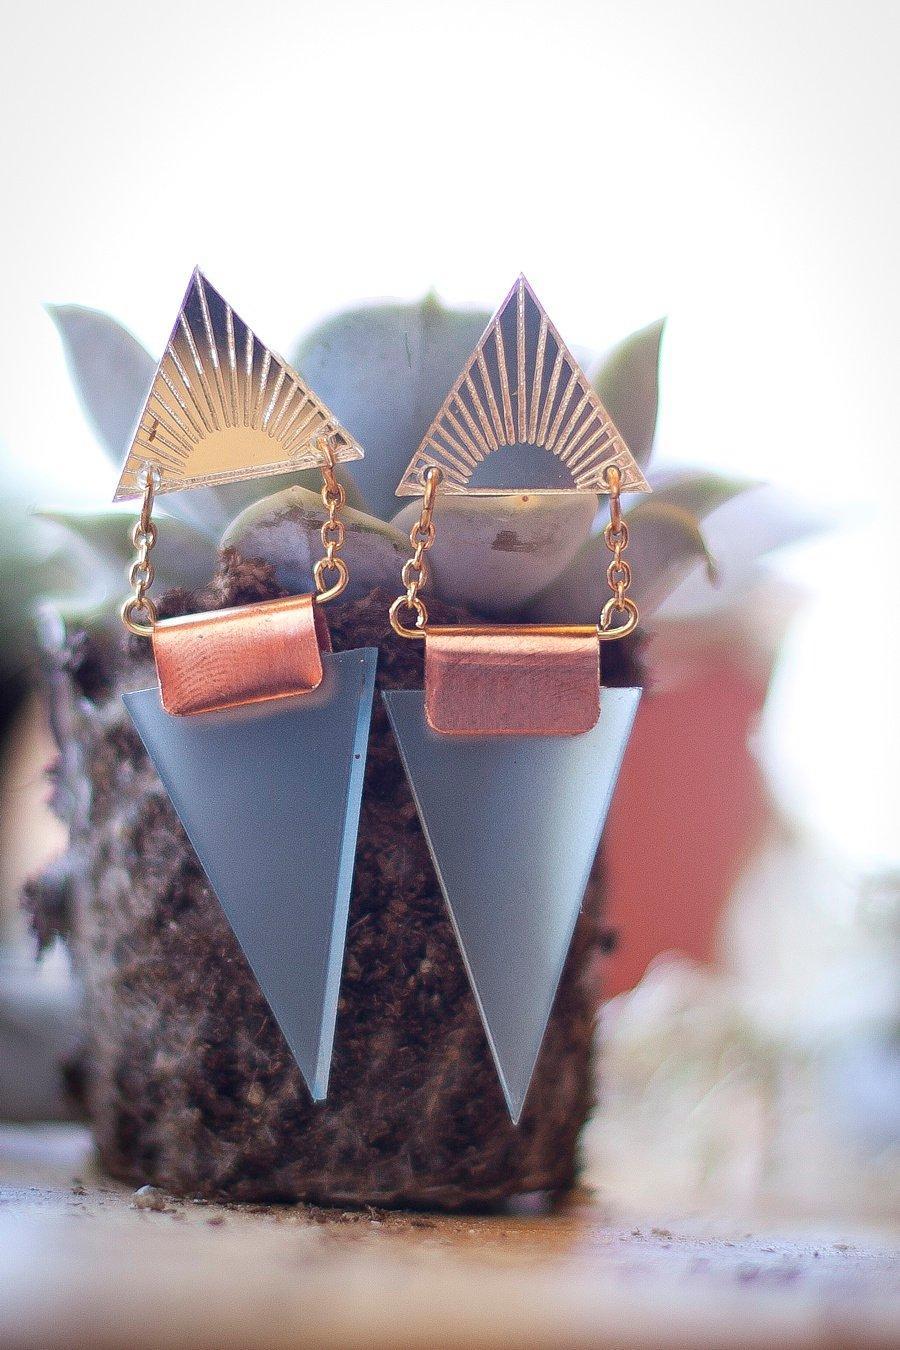 A Scandi Cool, Geometric Tipi Styled Wedding Shoot!